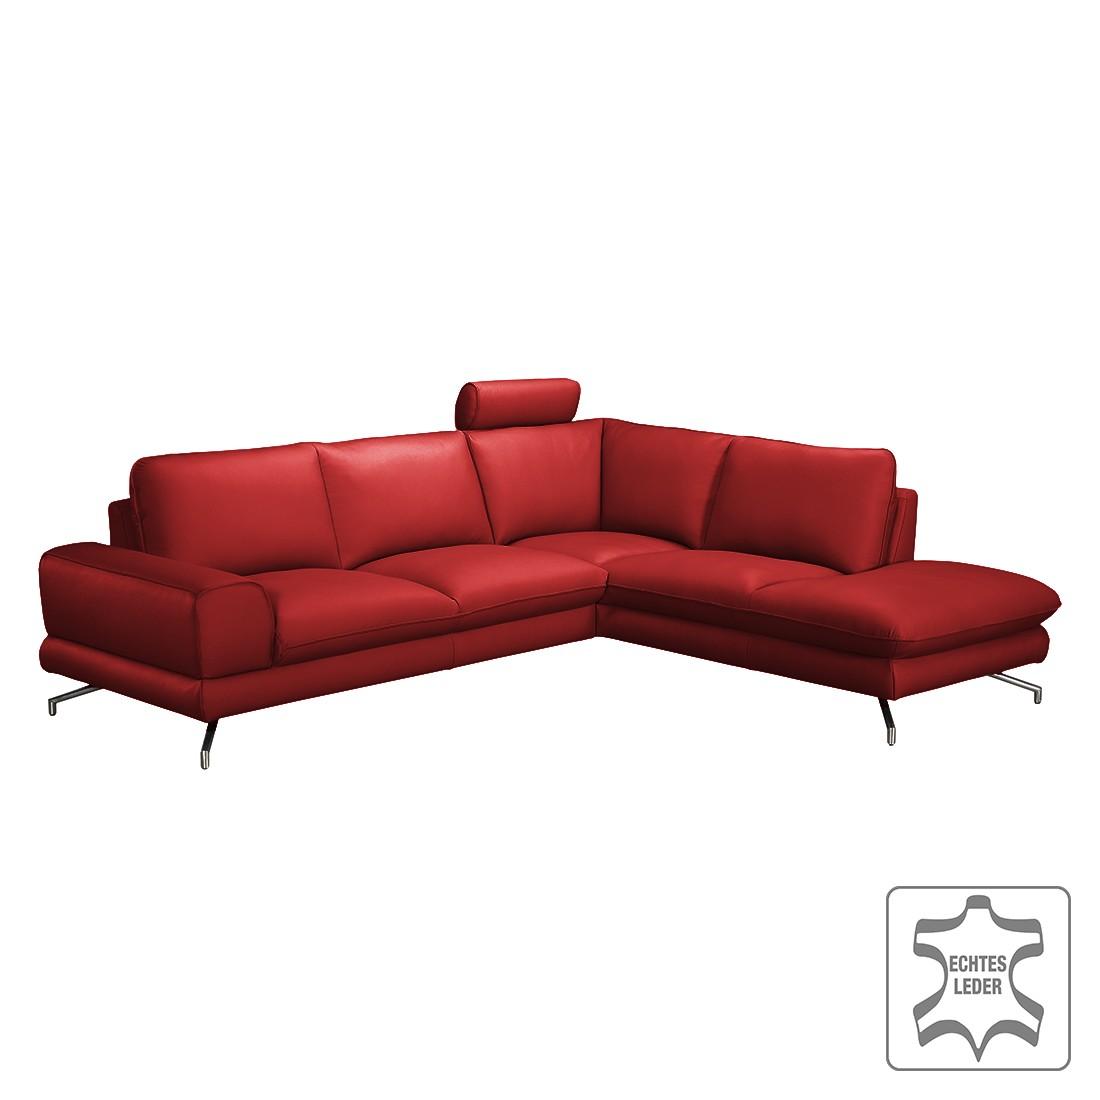 ecksofa lennard echtleder kaminrot ottomane davorstehend rechts ohne kopfst tze loftscape. Black Bedroom Furniture Sets. Home Design Ideas